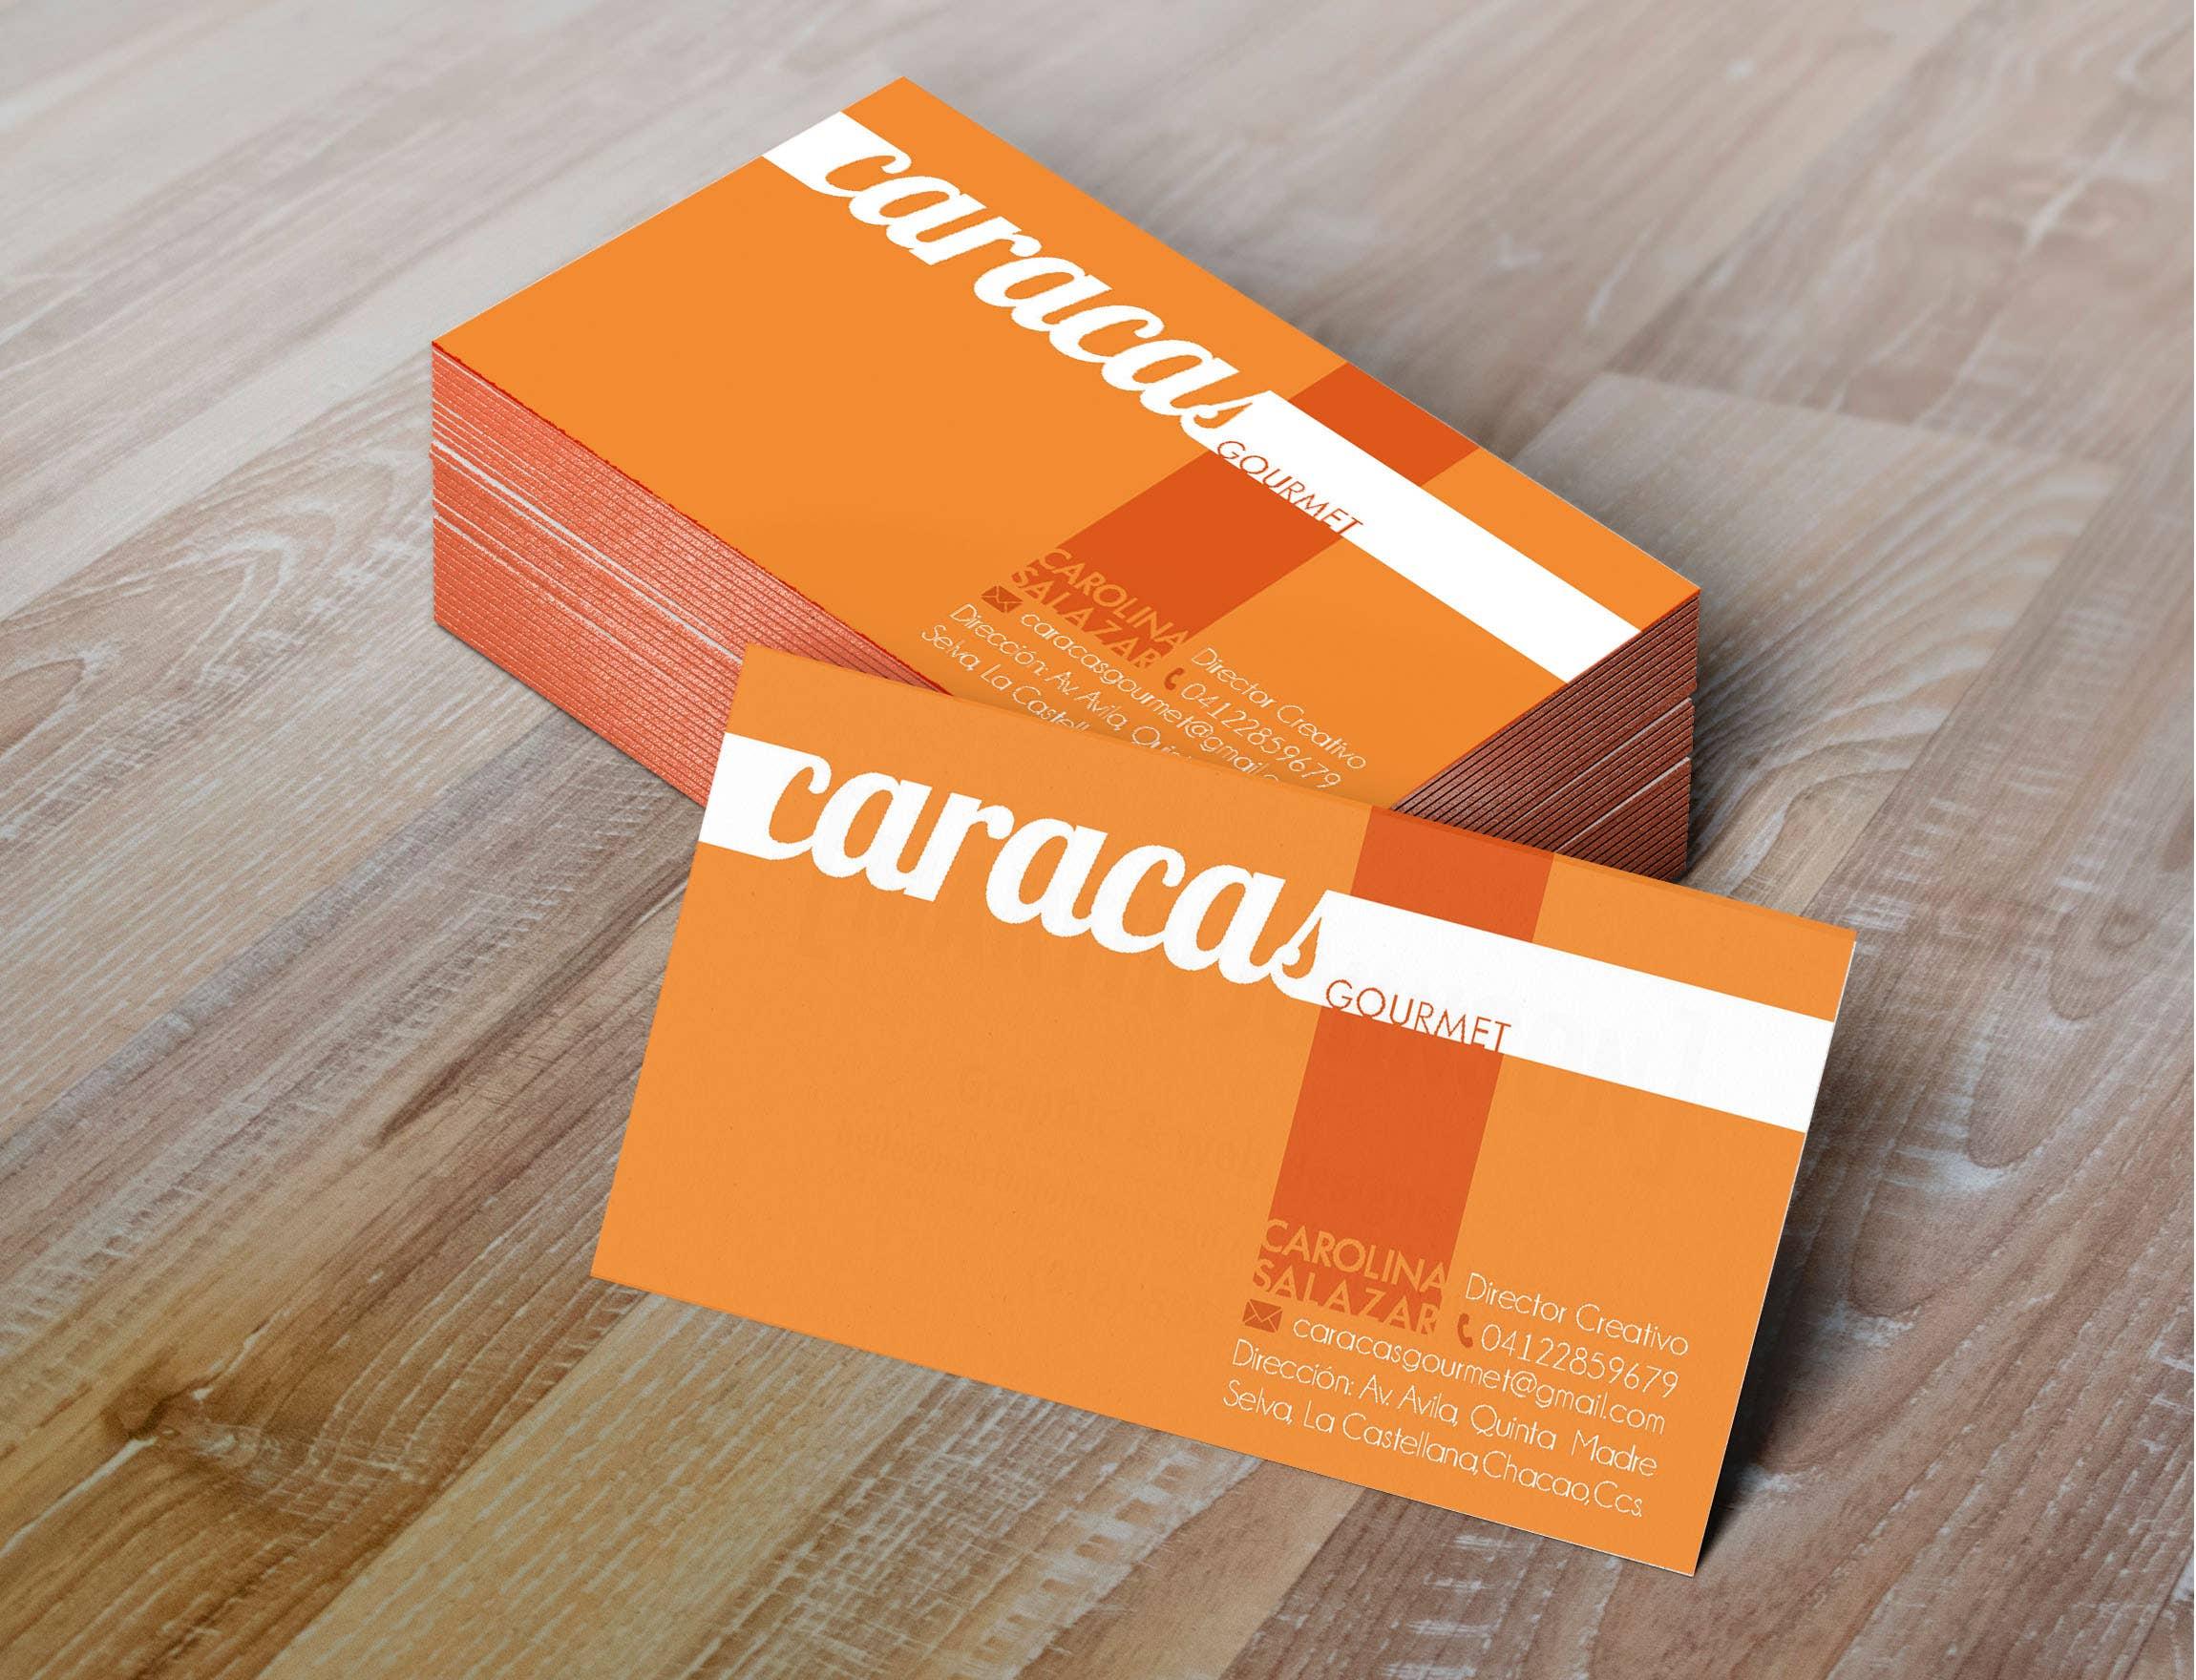 Card Business-tarjetas de presentación o visita